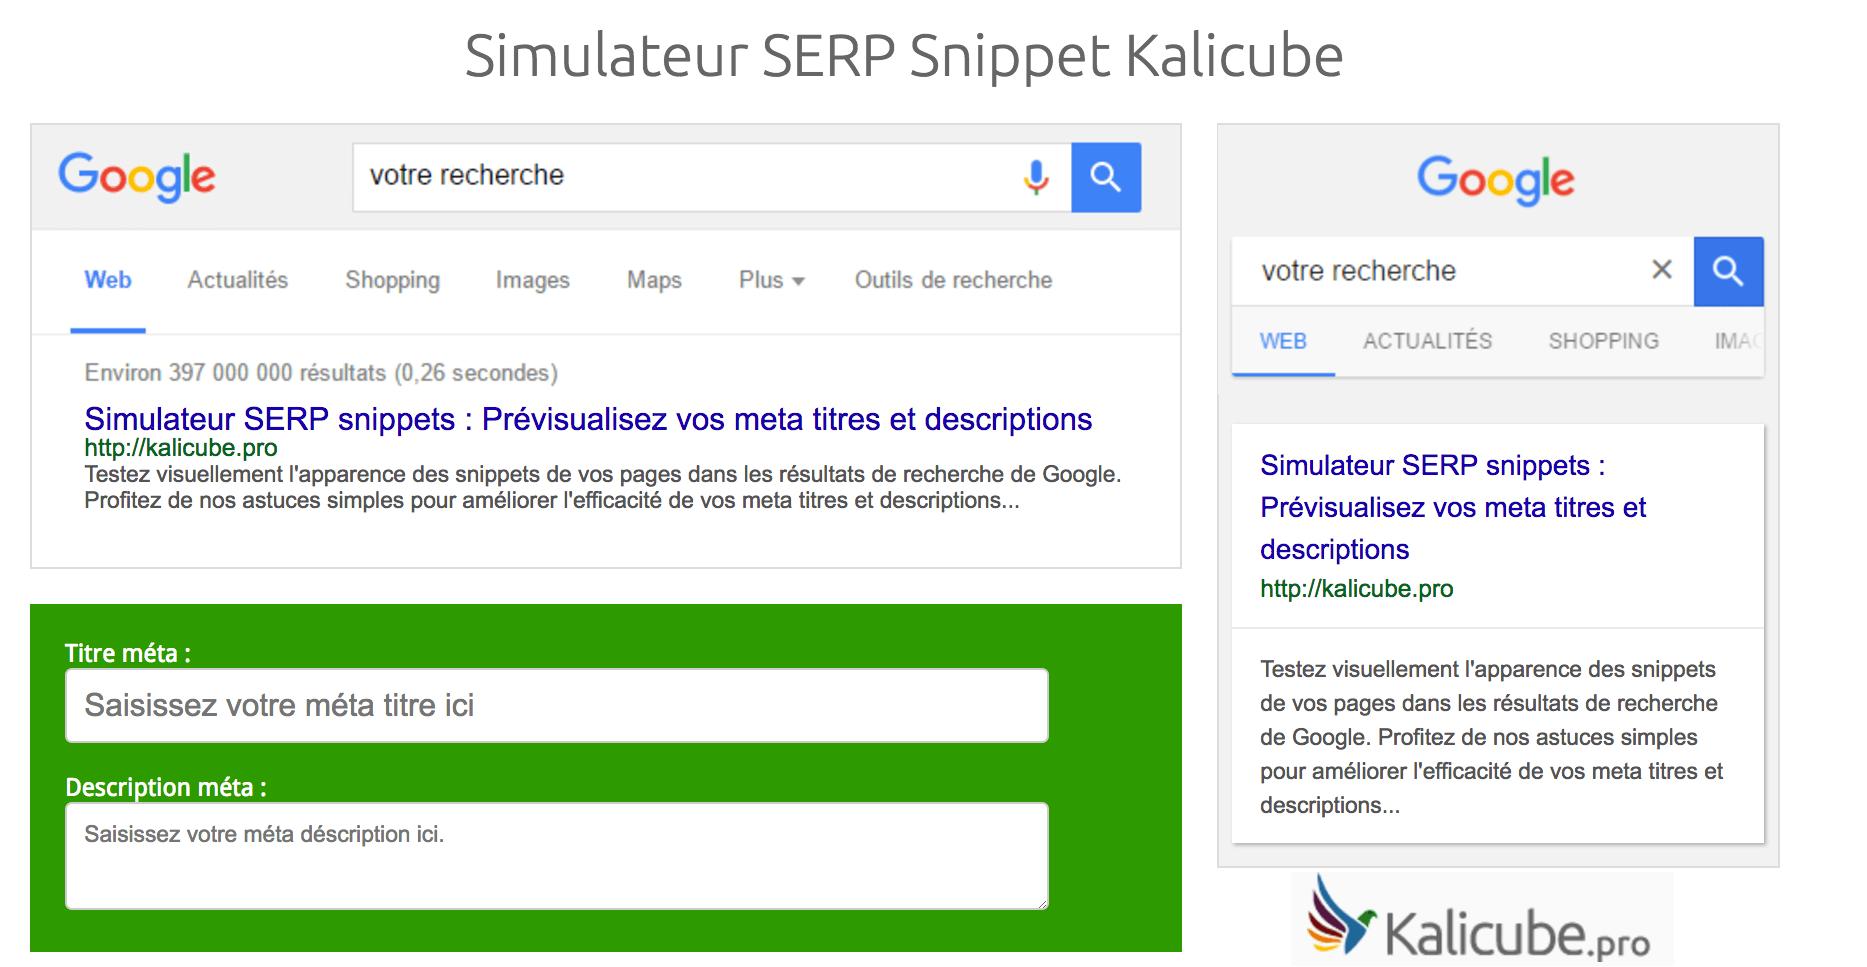 Simulateur SERP Snippet Kalicube